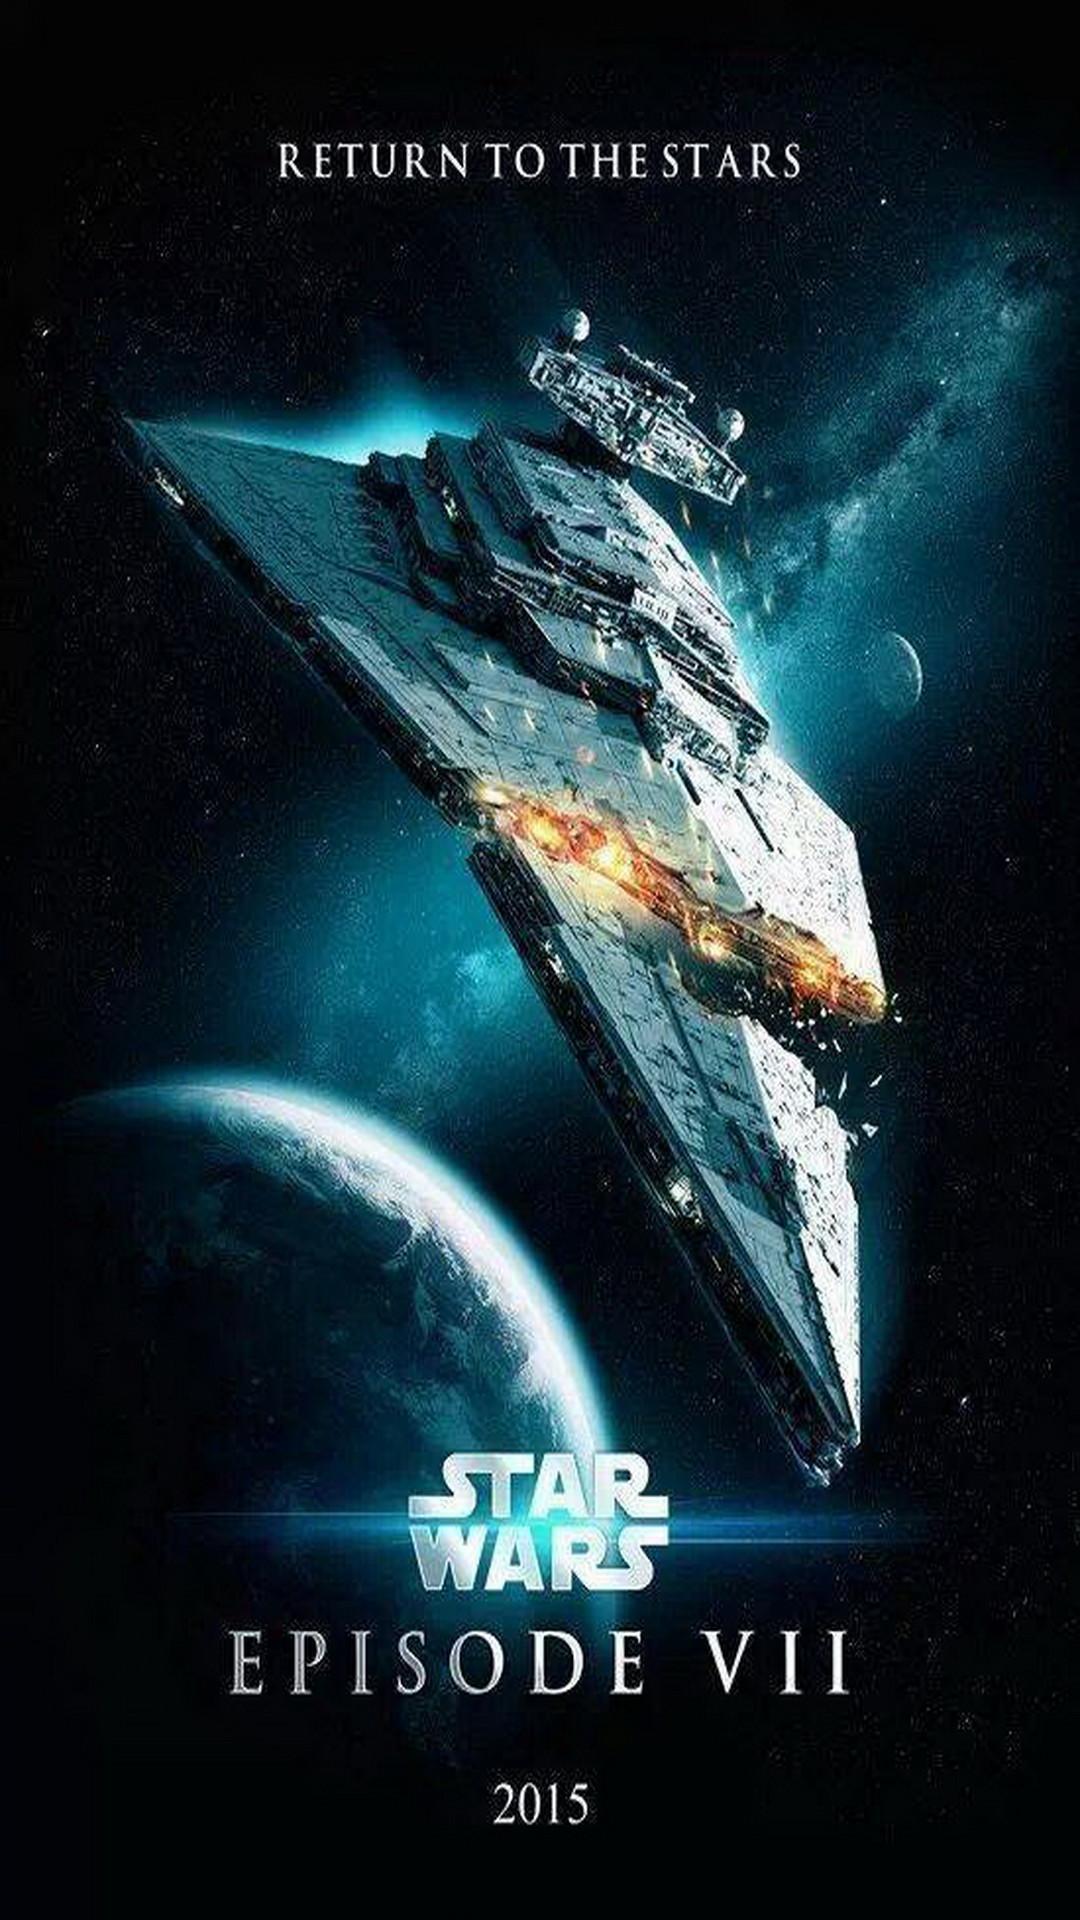 Star Wars Wallpaper iPhone 6